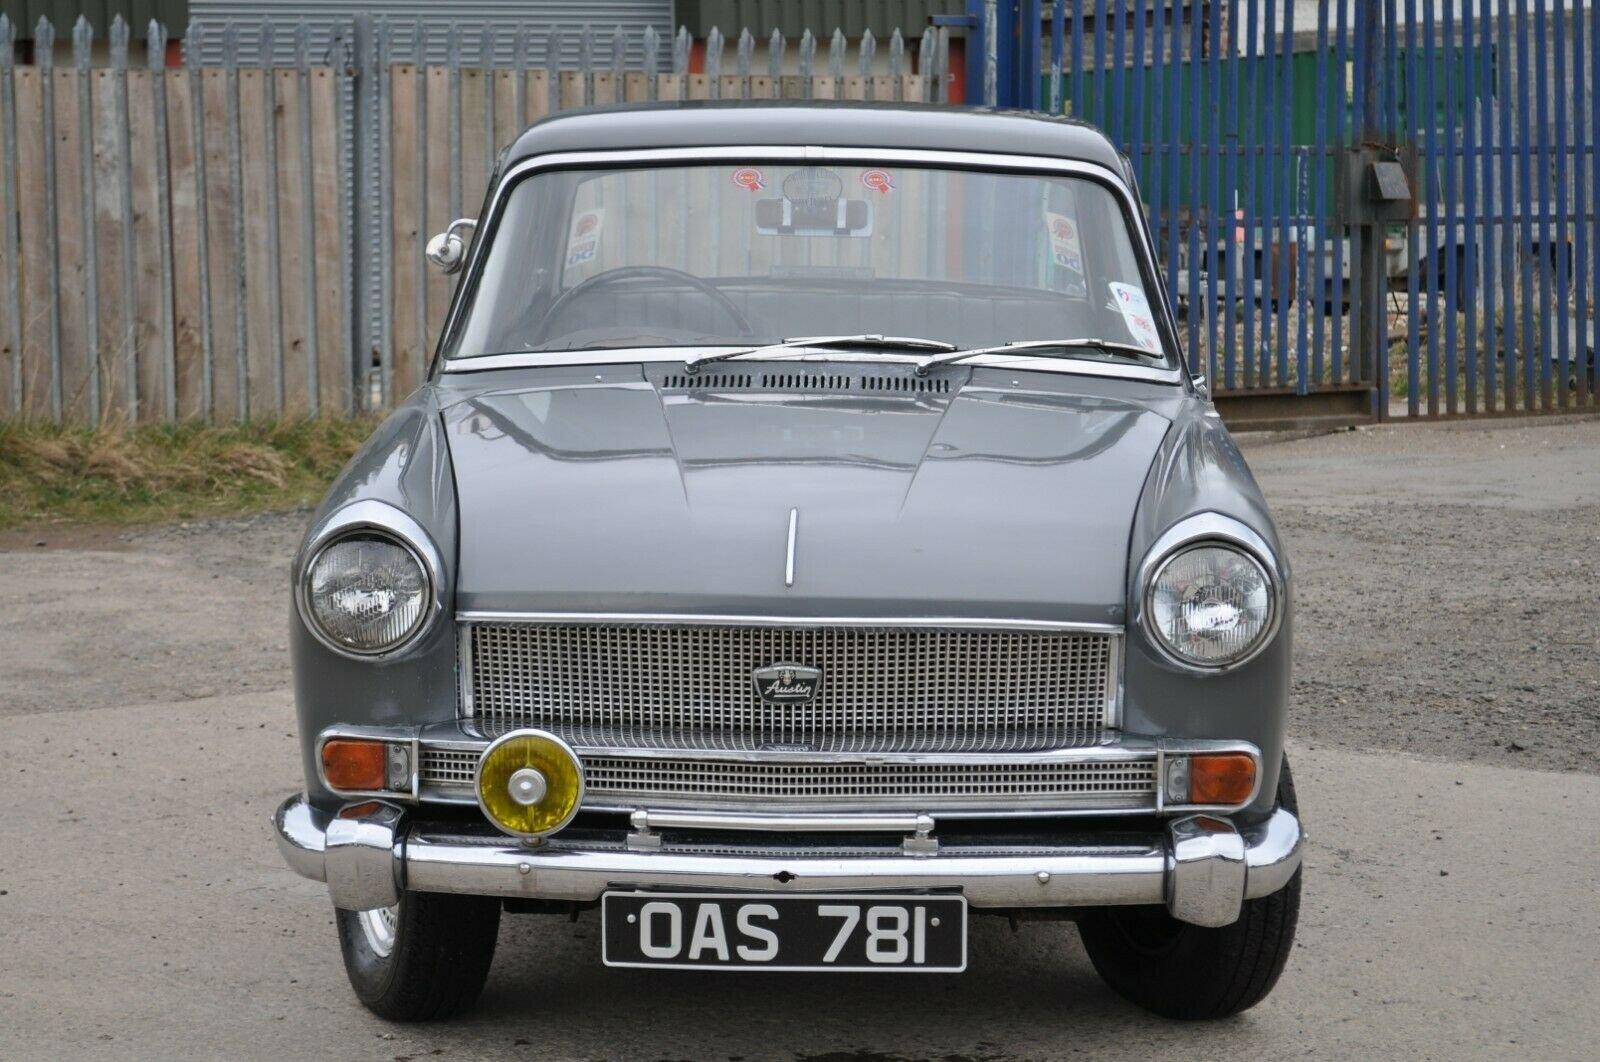 1961 AUSTIN CAMBRIDGE A55 FARINA TAX & MOT EXEMPT GRAMPIAN GREY For Sale (picture 1 of 6)